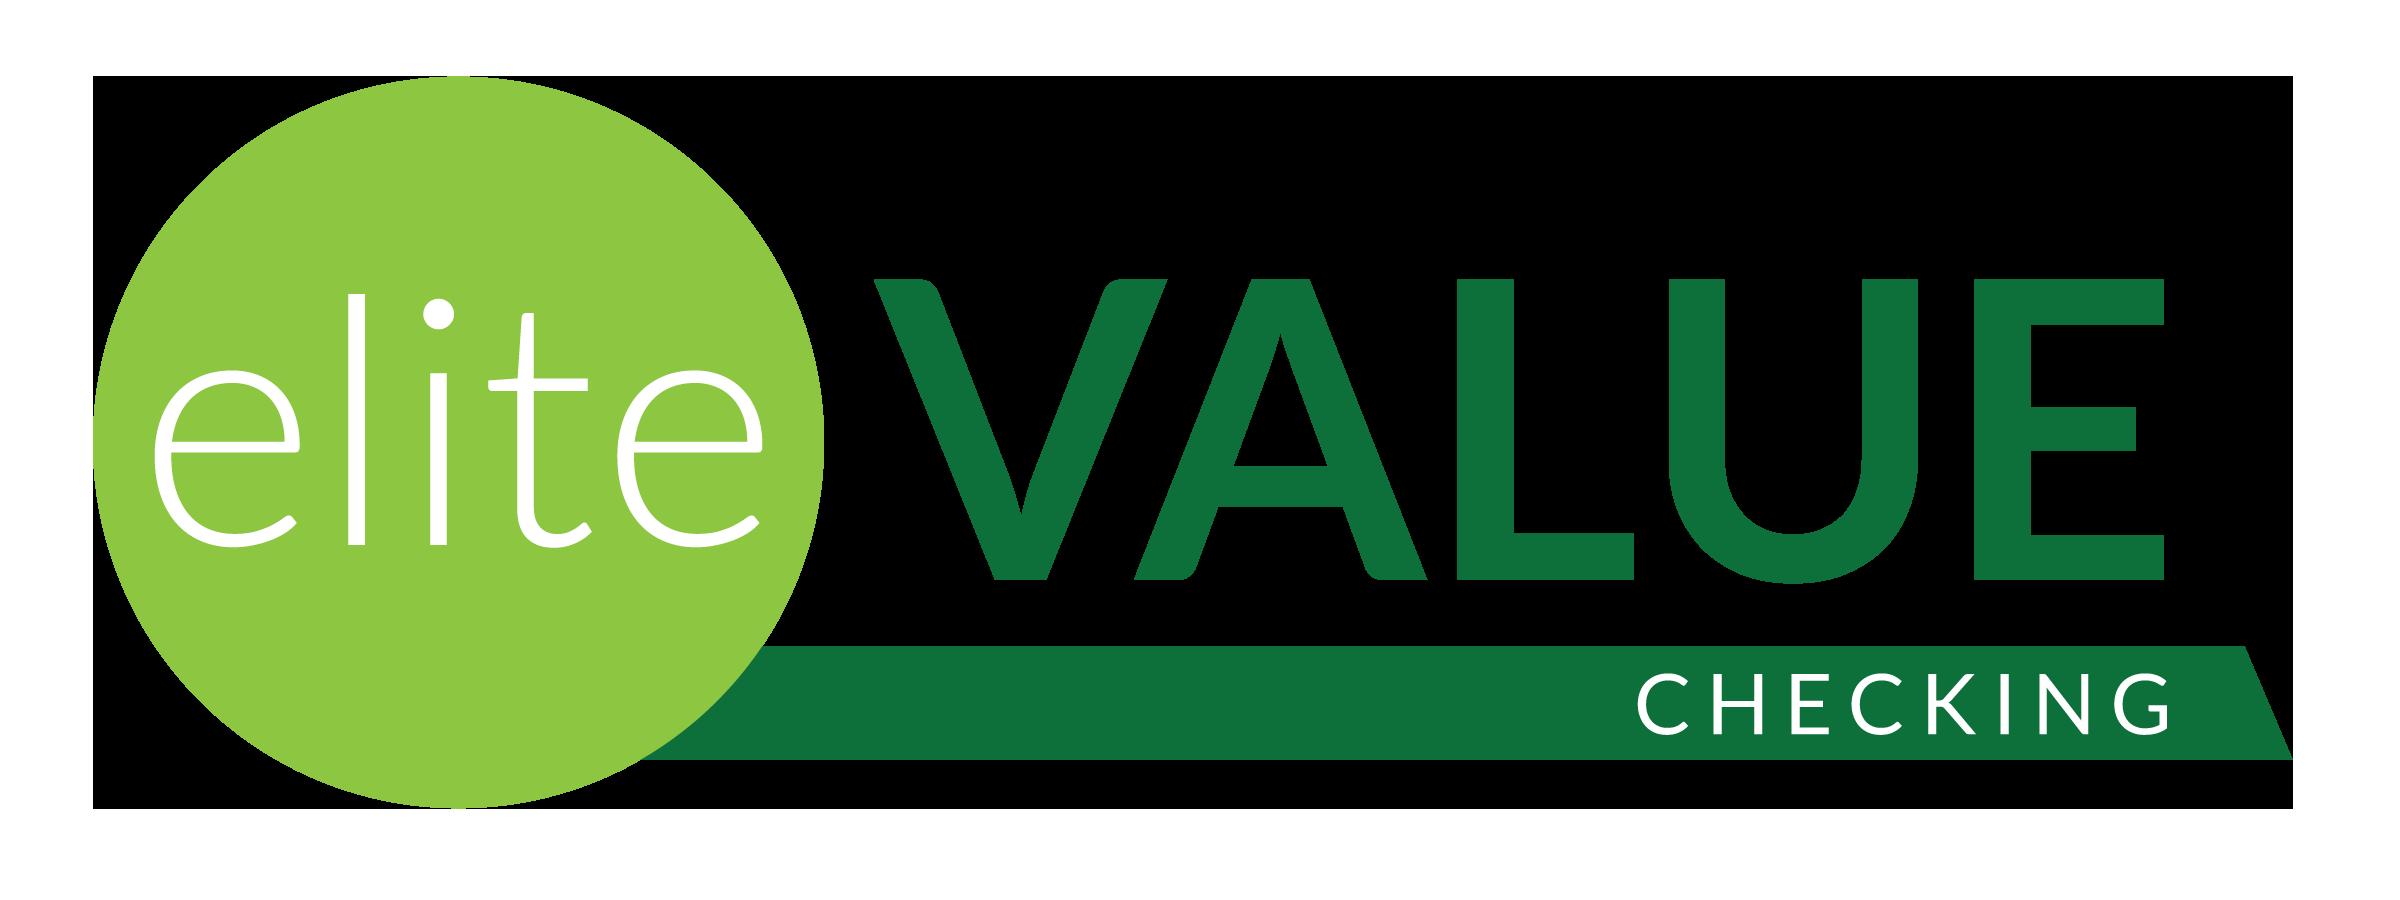 Elite Value Checking Logo